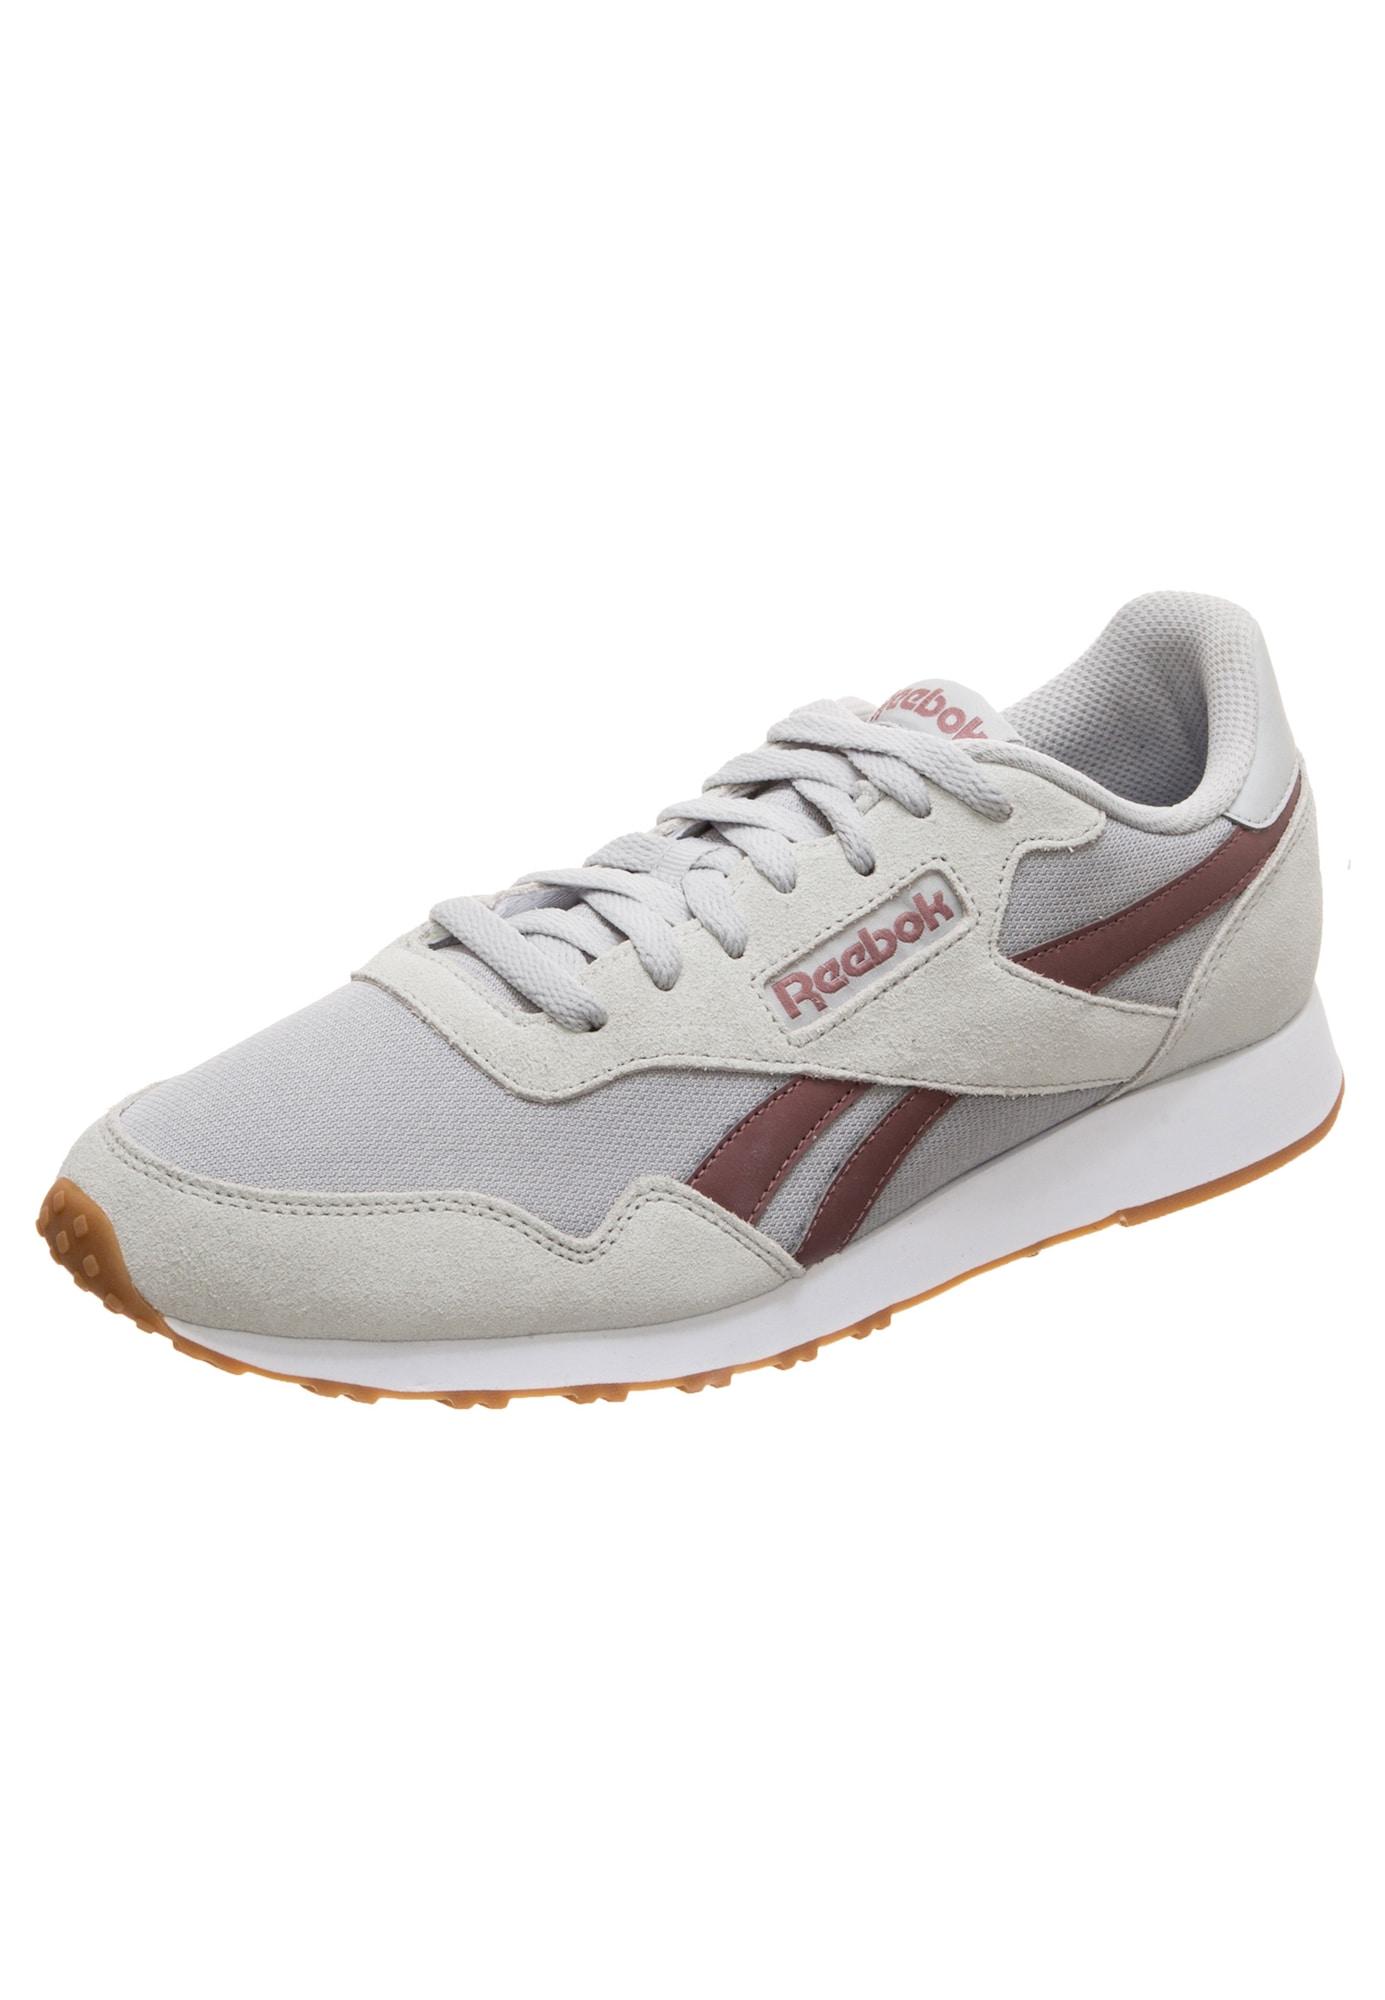 AboutYou Herren Reebok Classic Reebok Classic Sneaker Royal Ultra beige, grau, rot, pink, weiß, schwarz, schwarz, weiß |